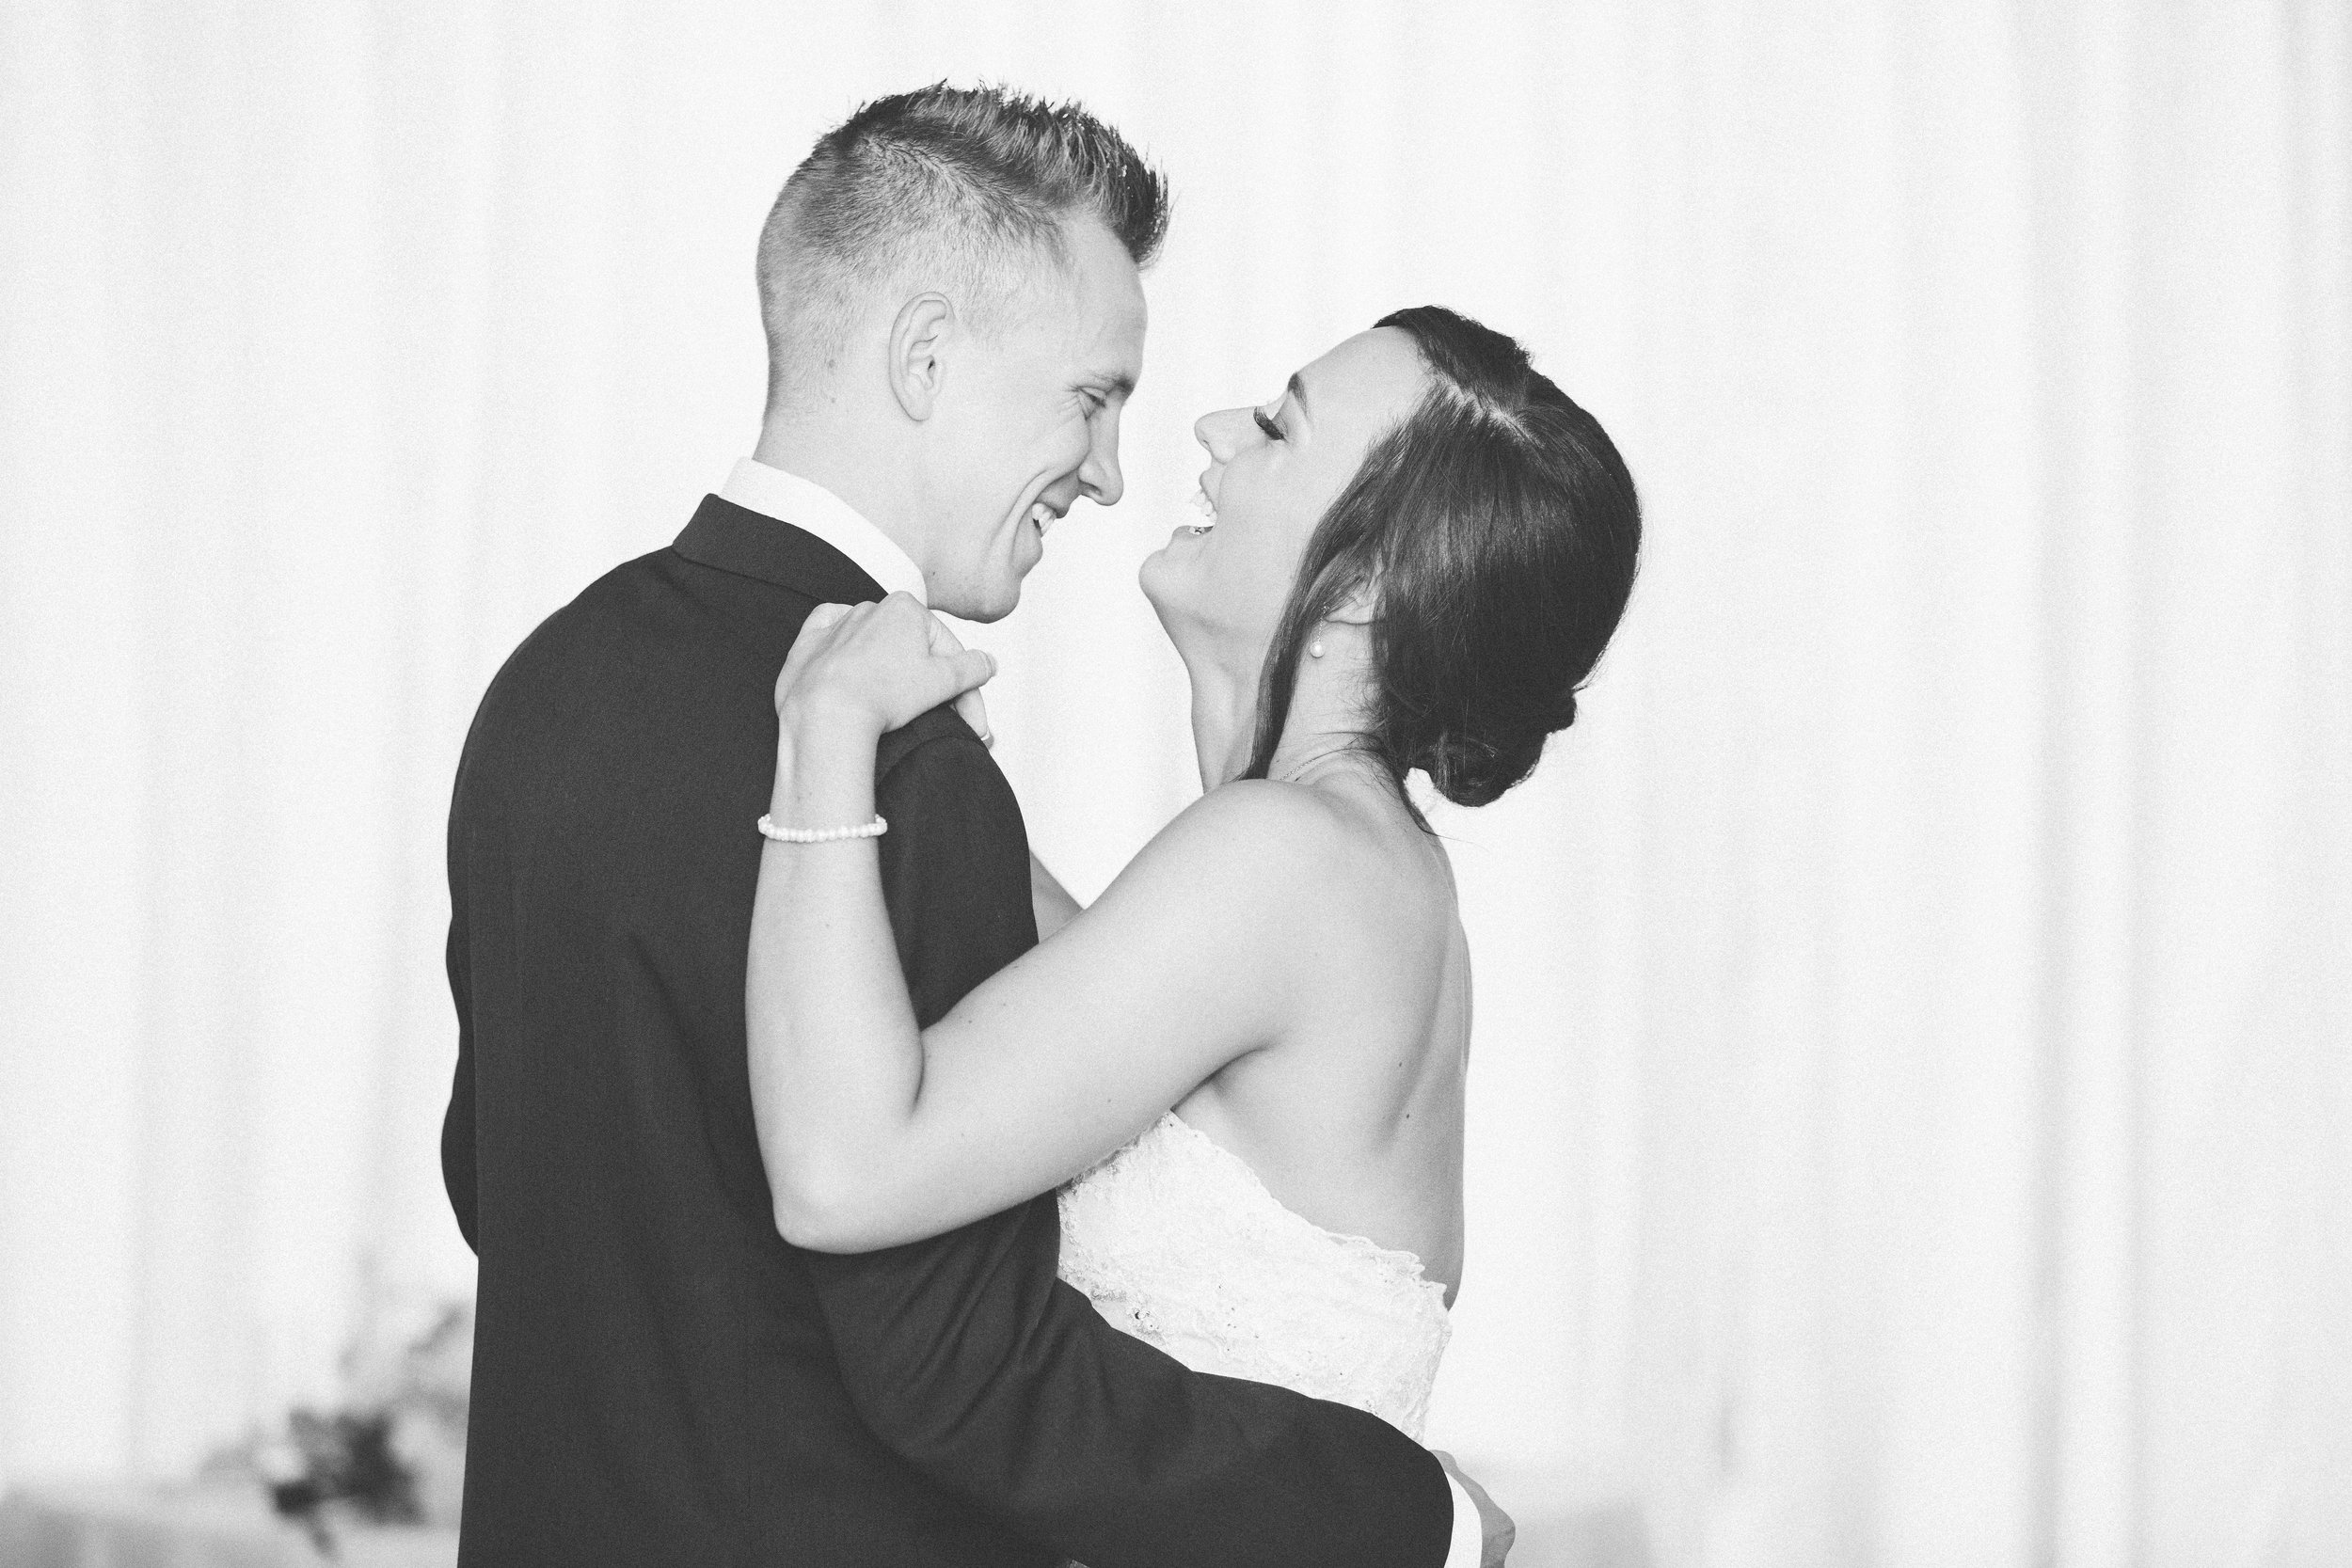 MP_16.06.12_Zach-&-Katlyn-Wedding-3833.jpg